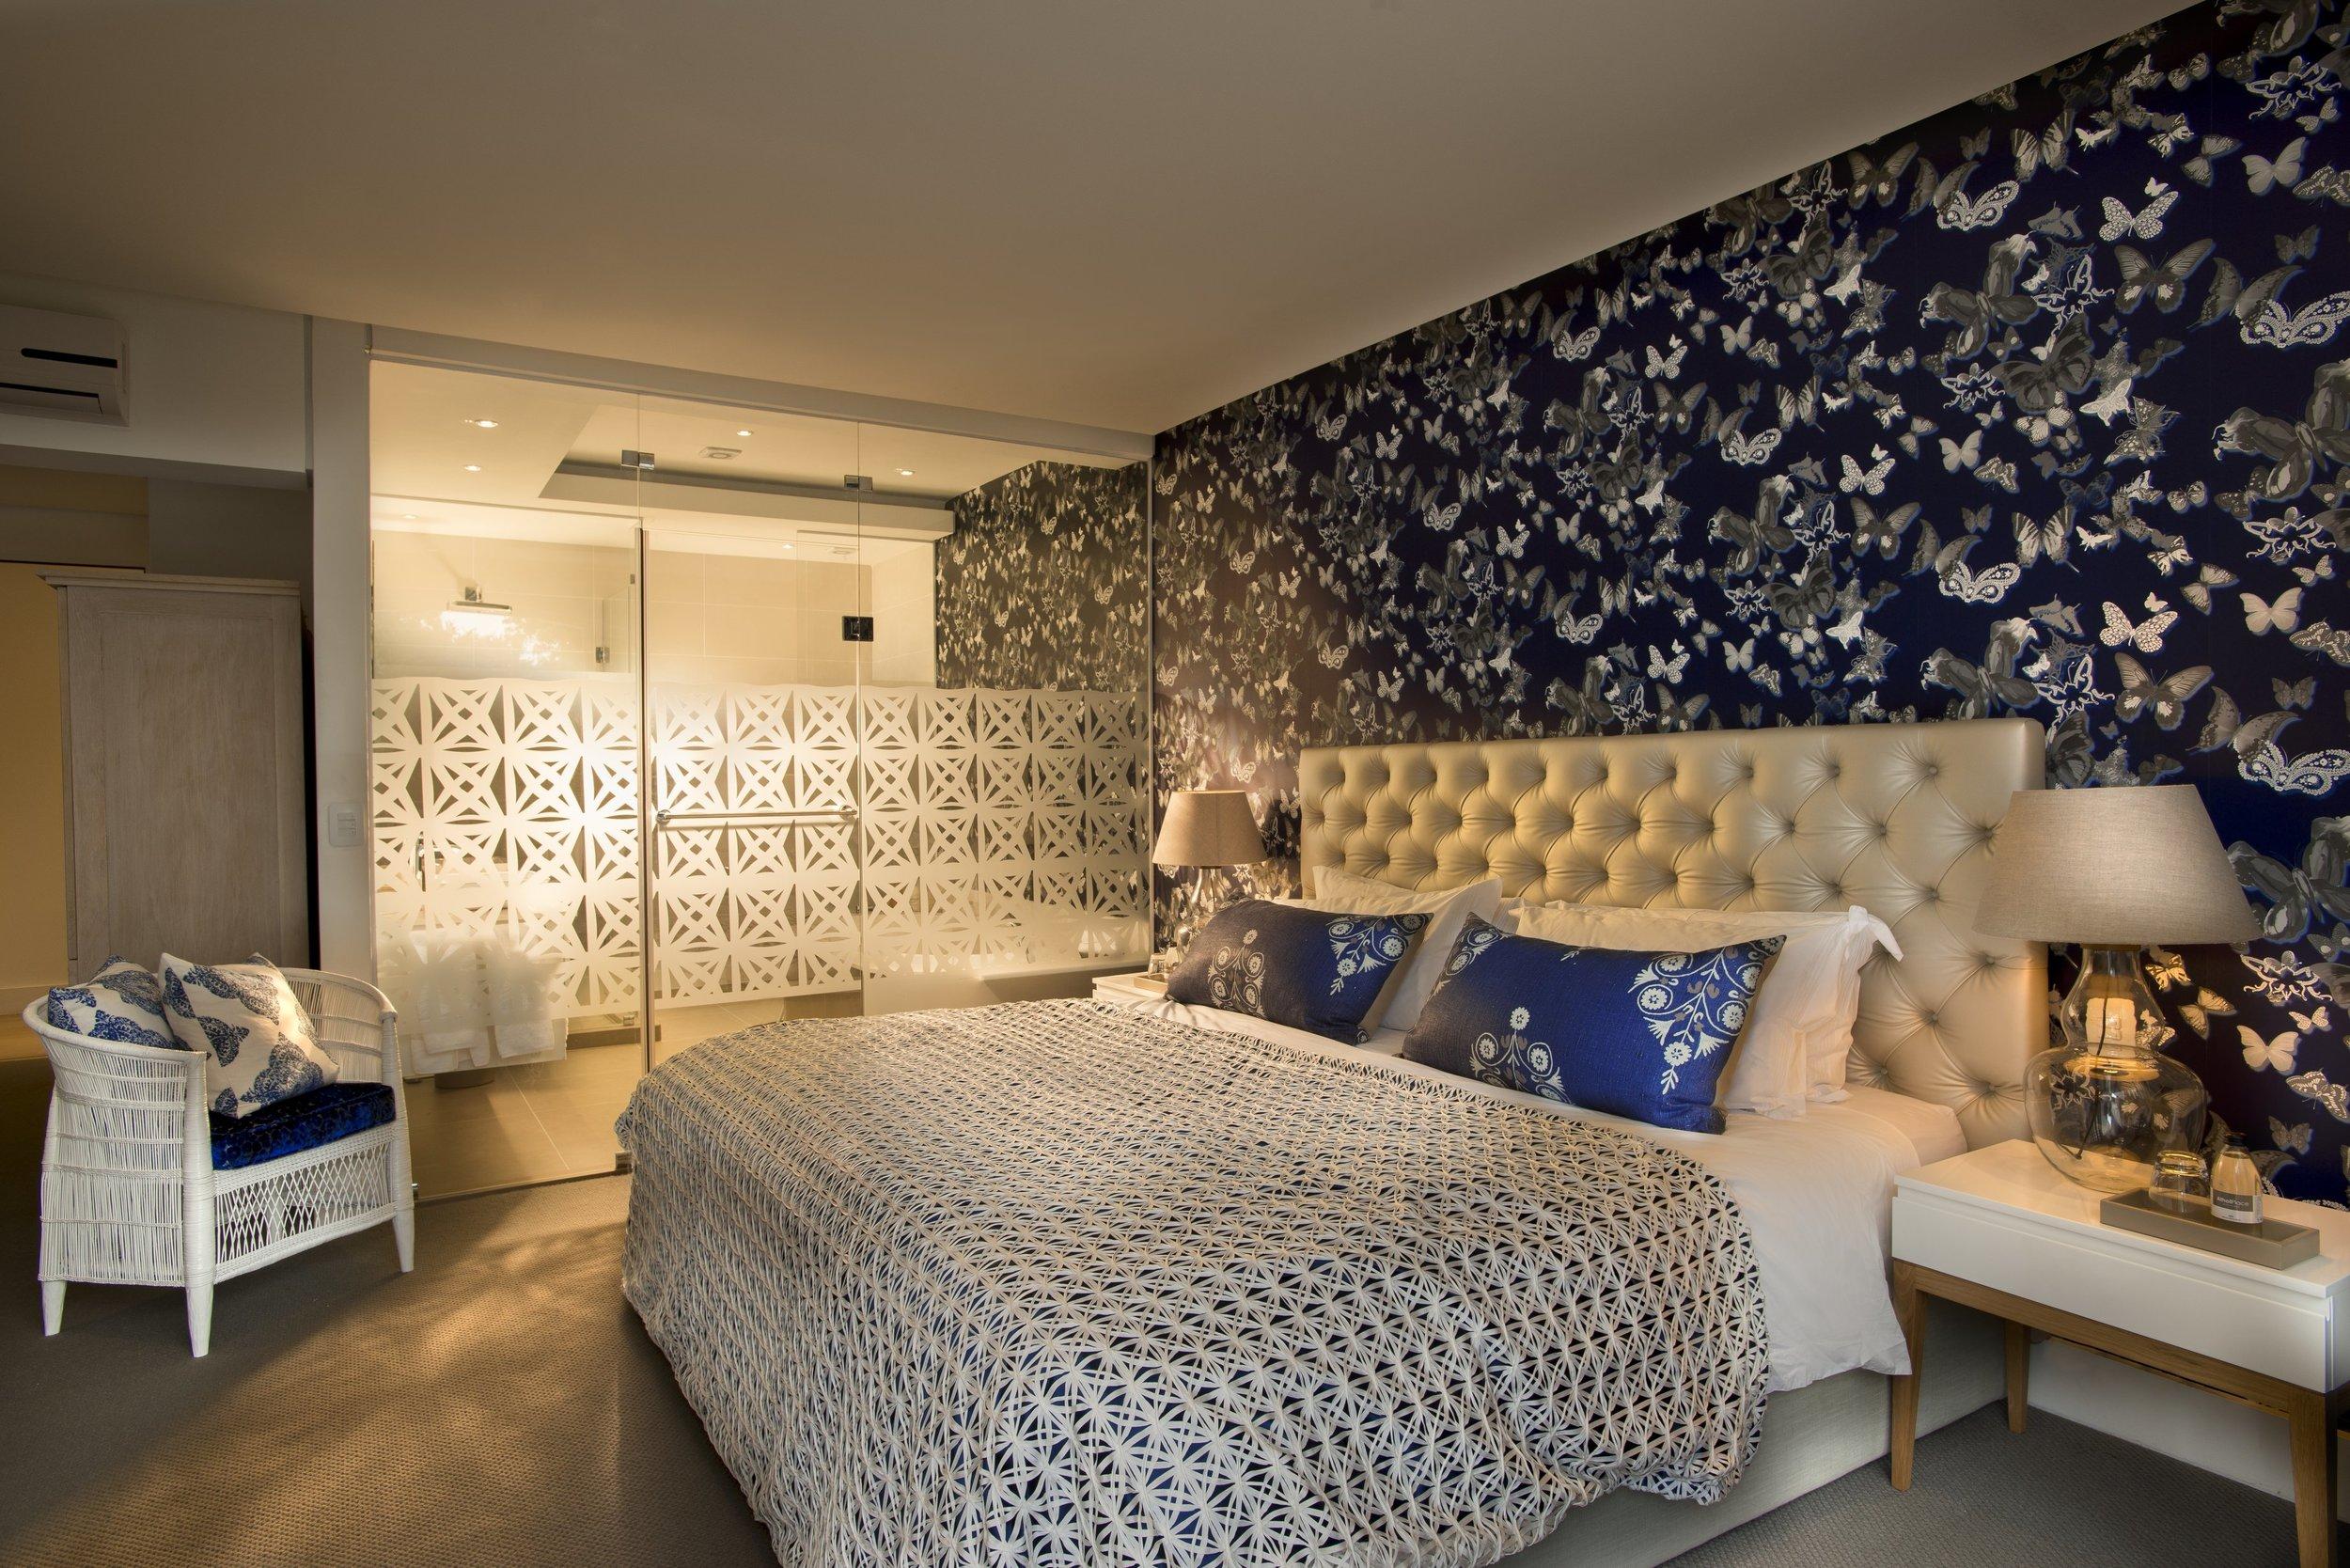 rsz_atholplace_villa_-_bedroom_2_1.jpg